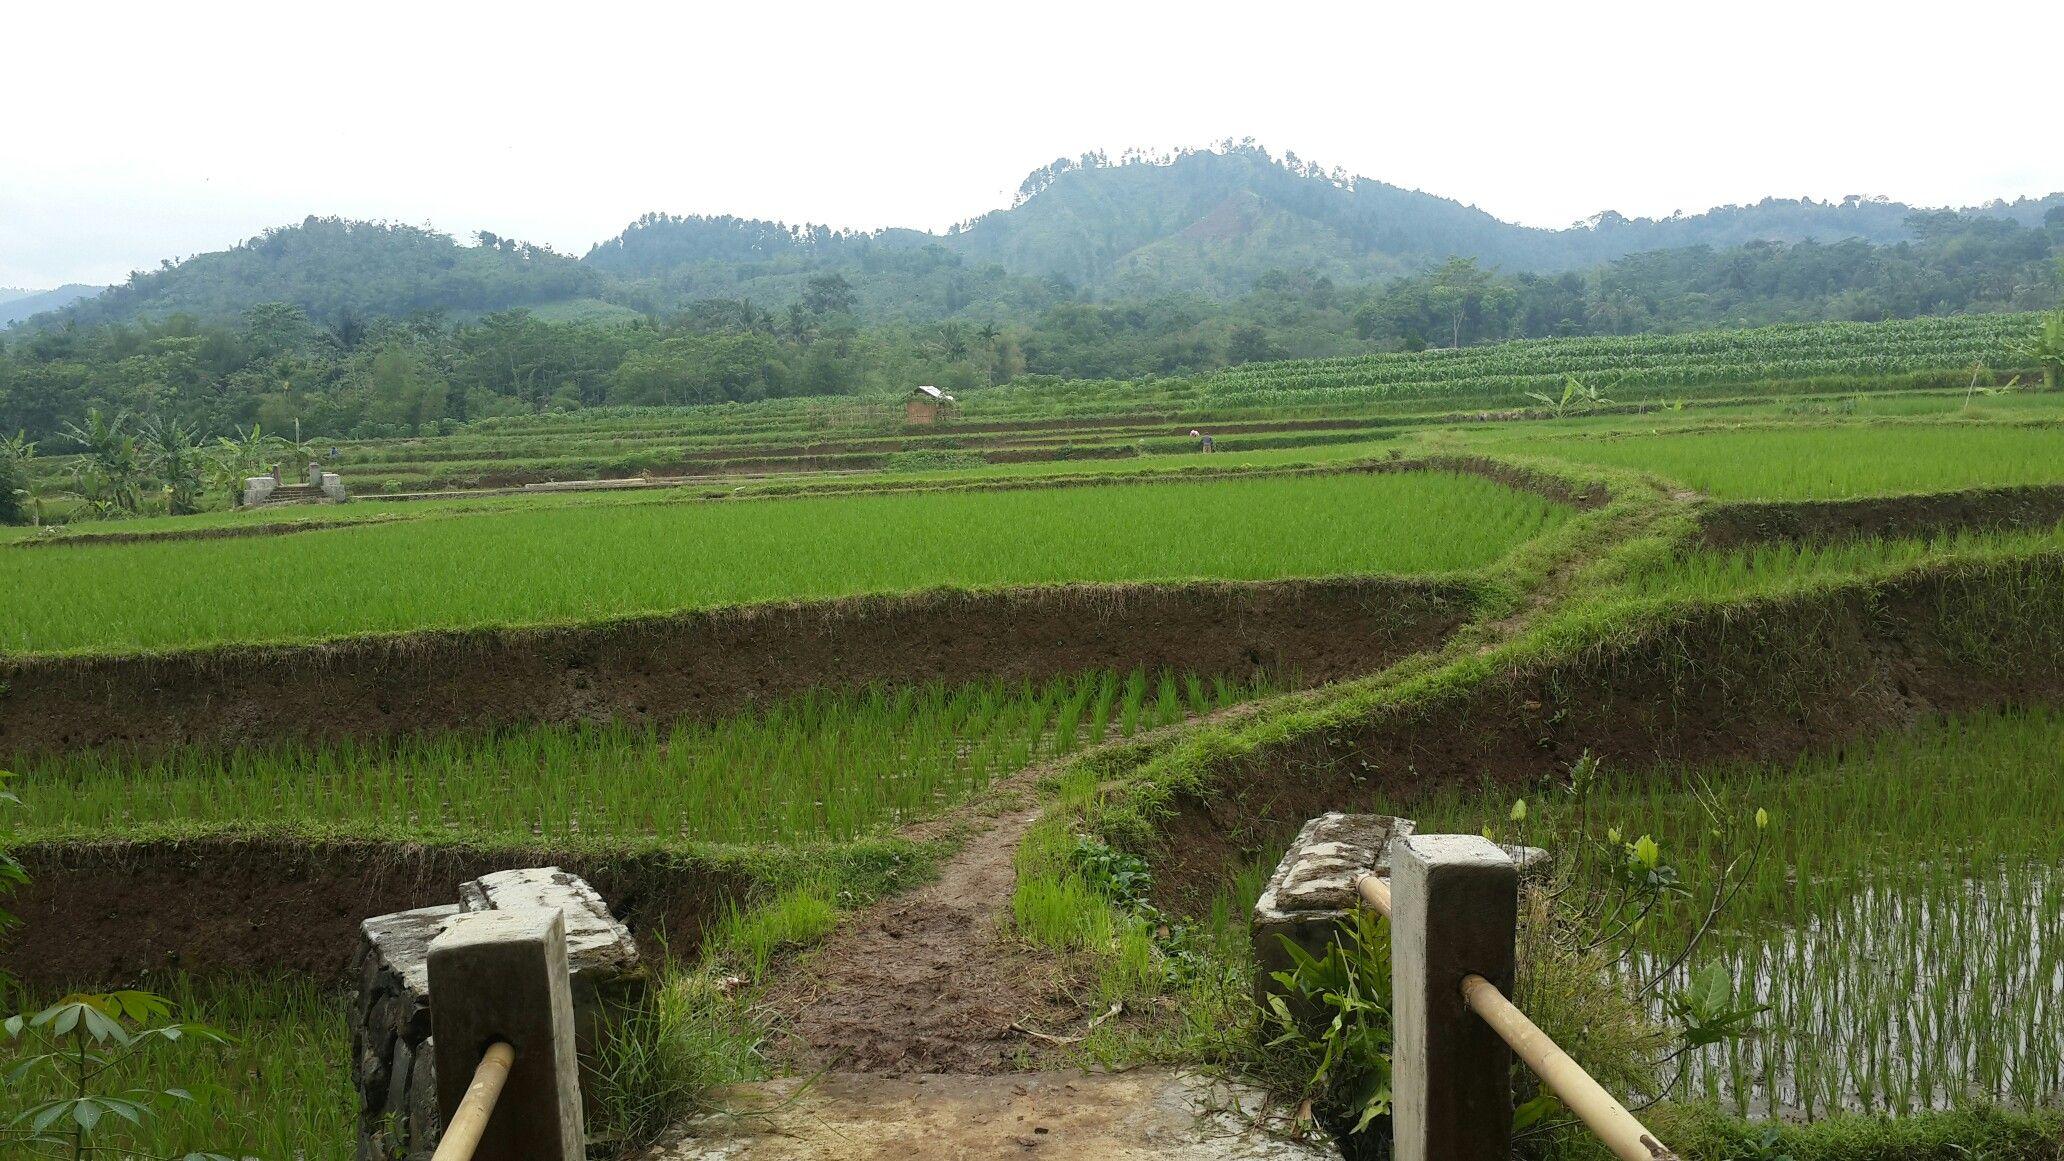 Desa Karangdawa Kecamatan Warungpring Kabupaten Pemalang Jawa Tengah Pedesaan